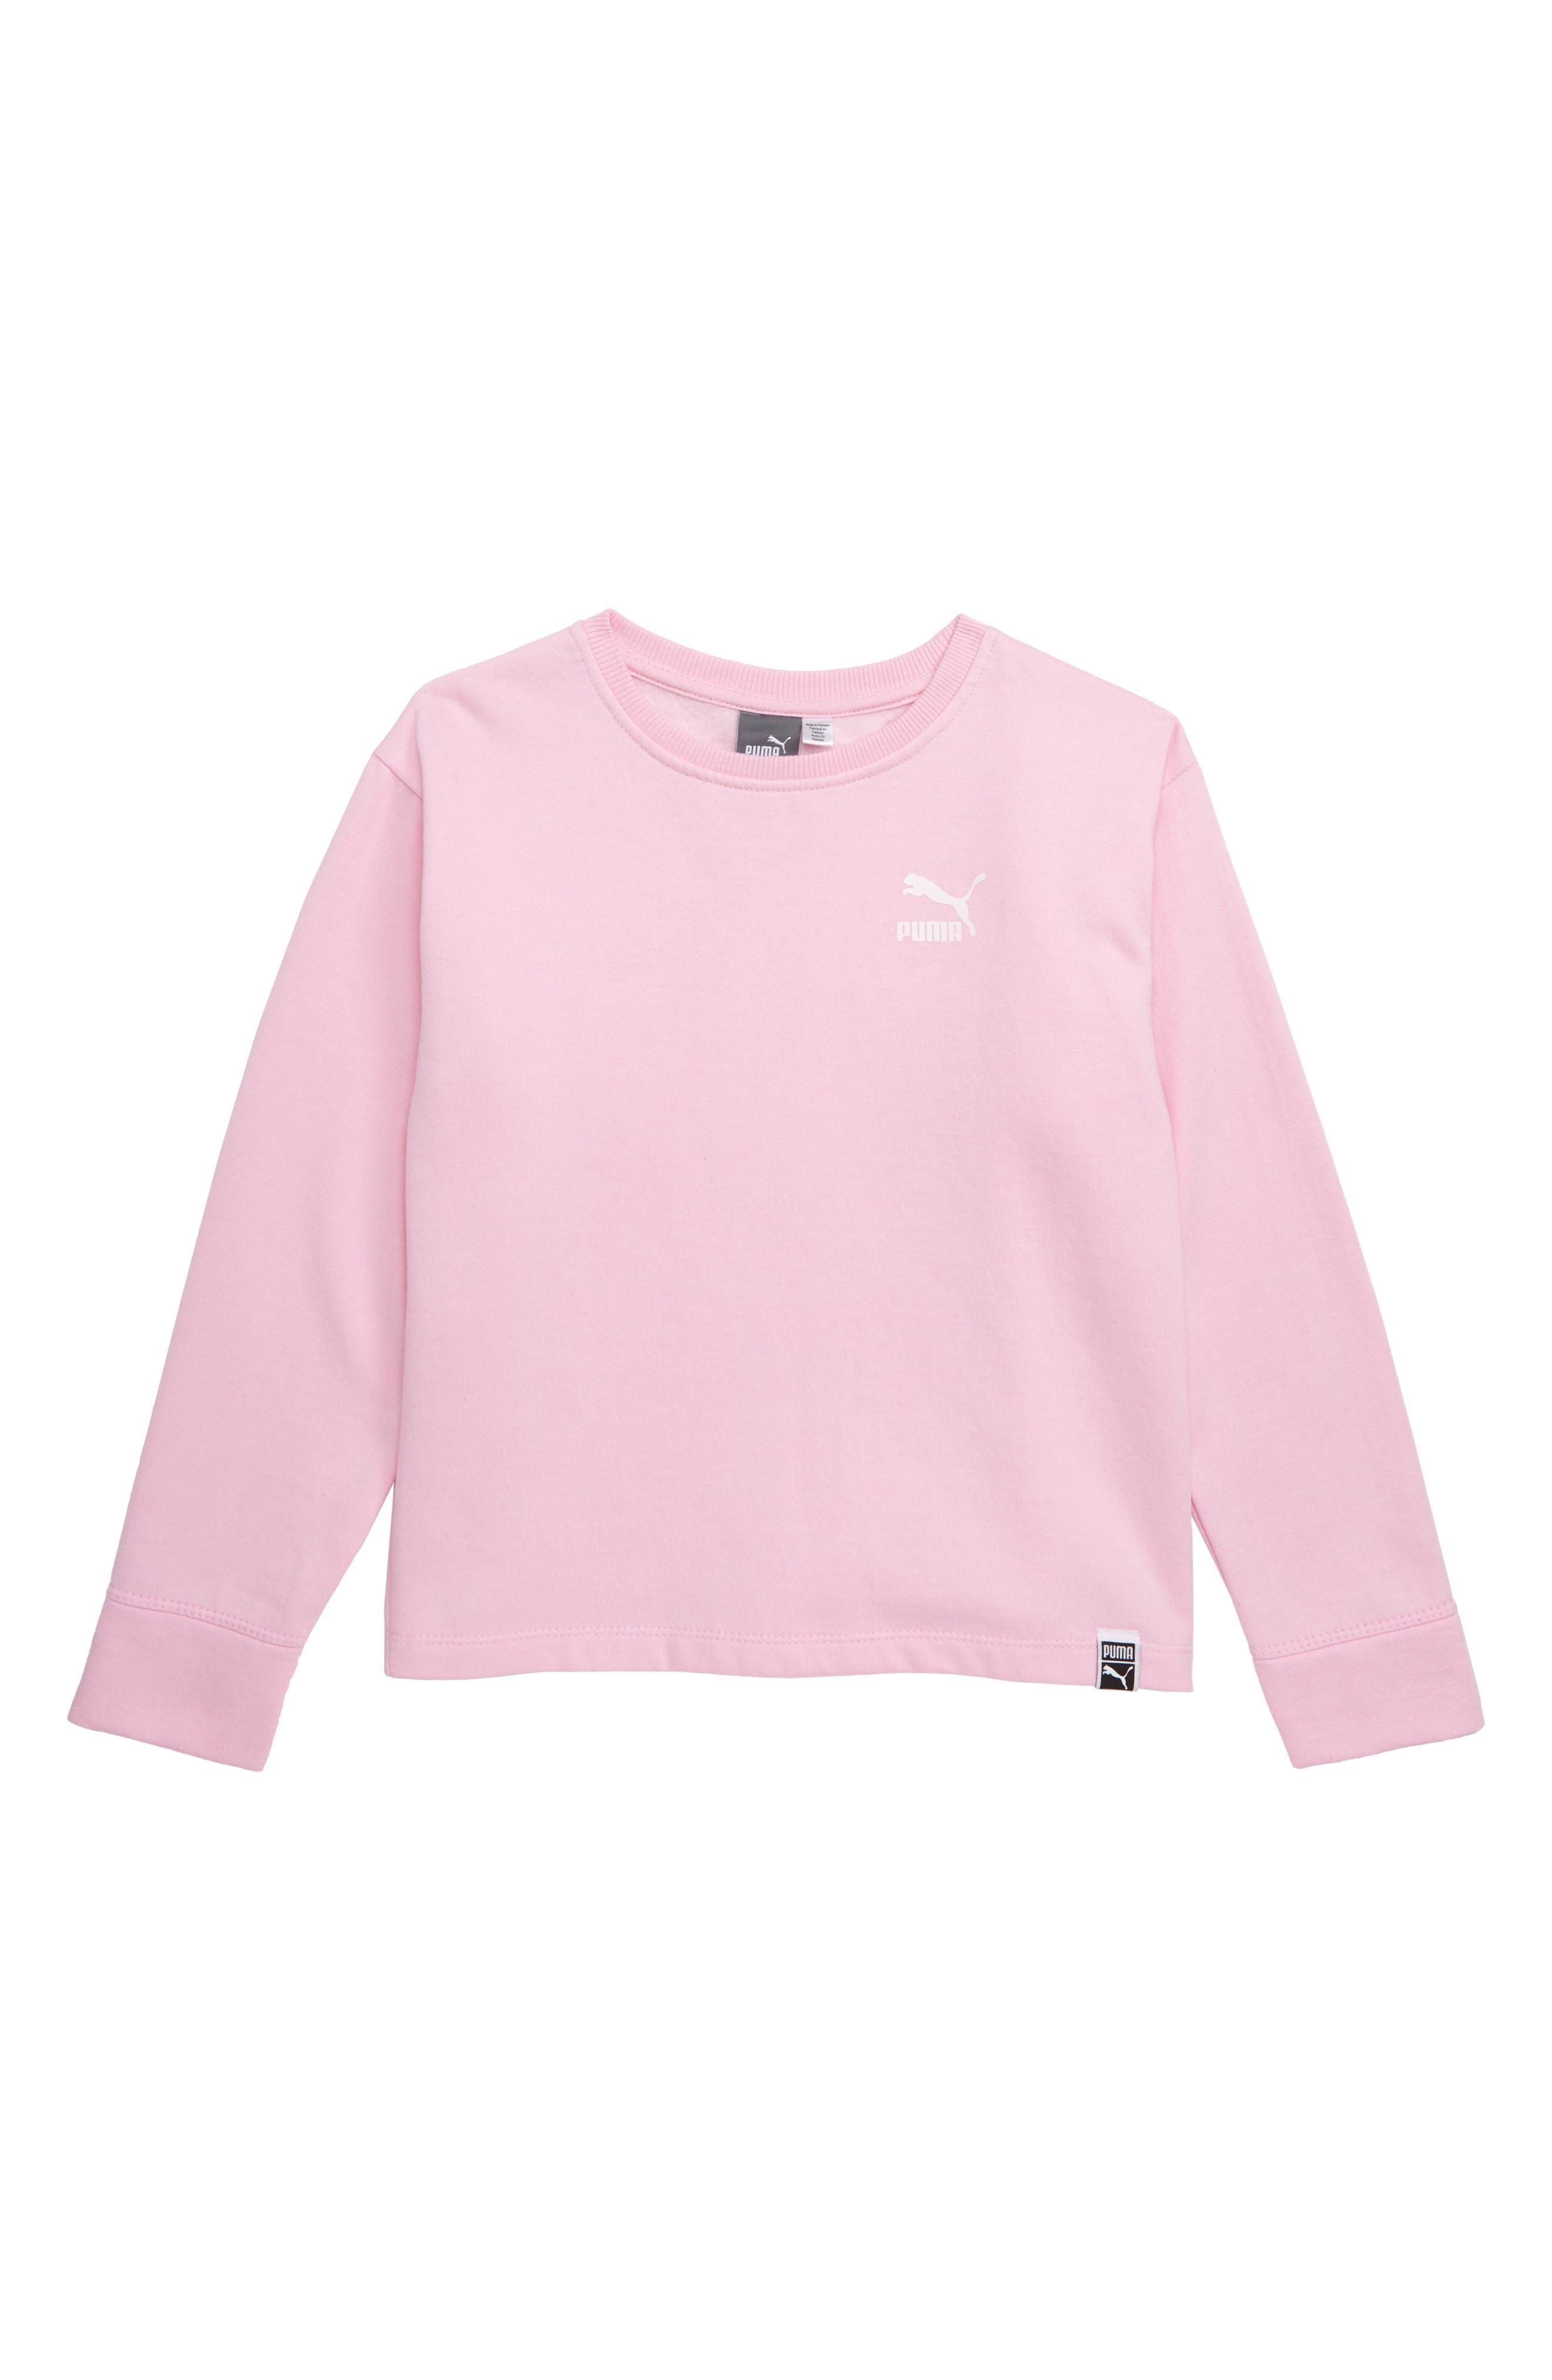 PUMA,                             Oversize Fleece Pullover,                             Main thumbnail 1, color,                             PALE PINK